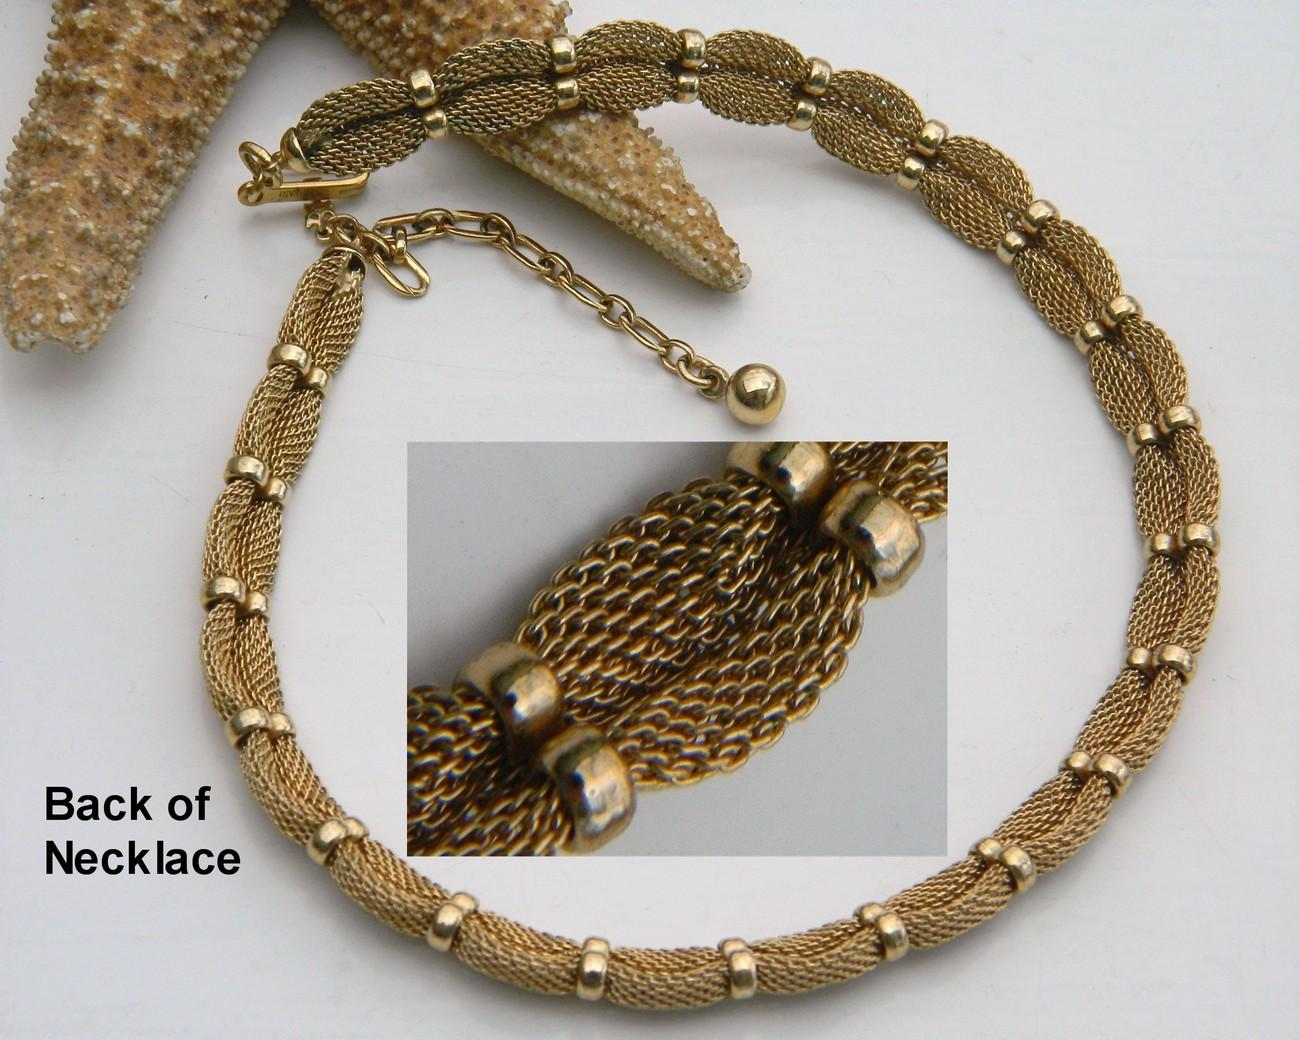 Vintage Trifari Mesh Choker Necklace Goldtone Crown Hang Tag